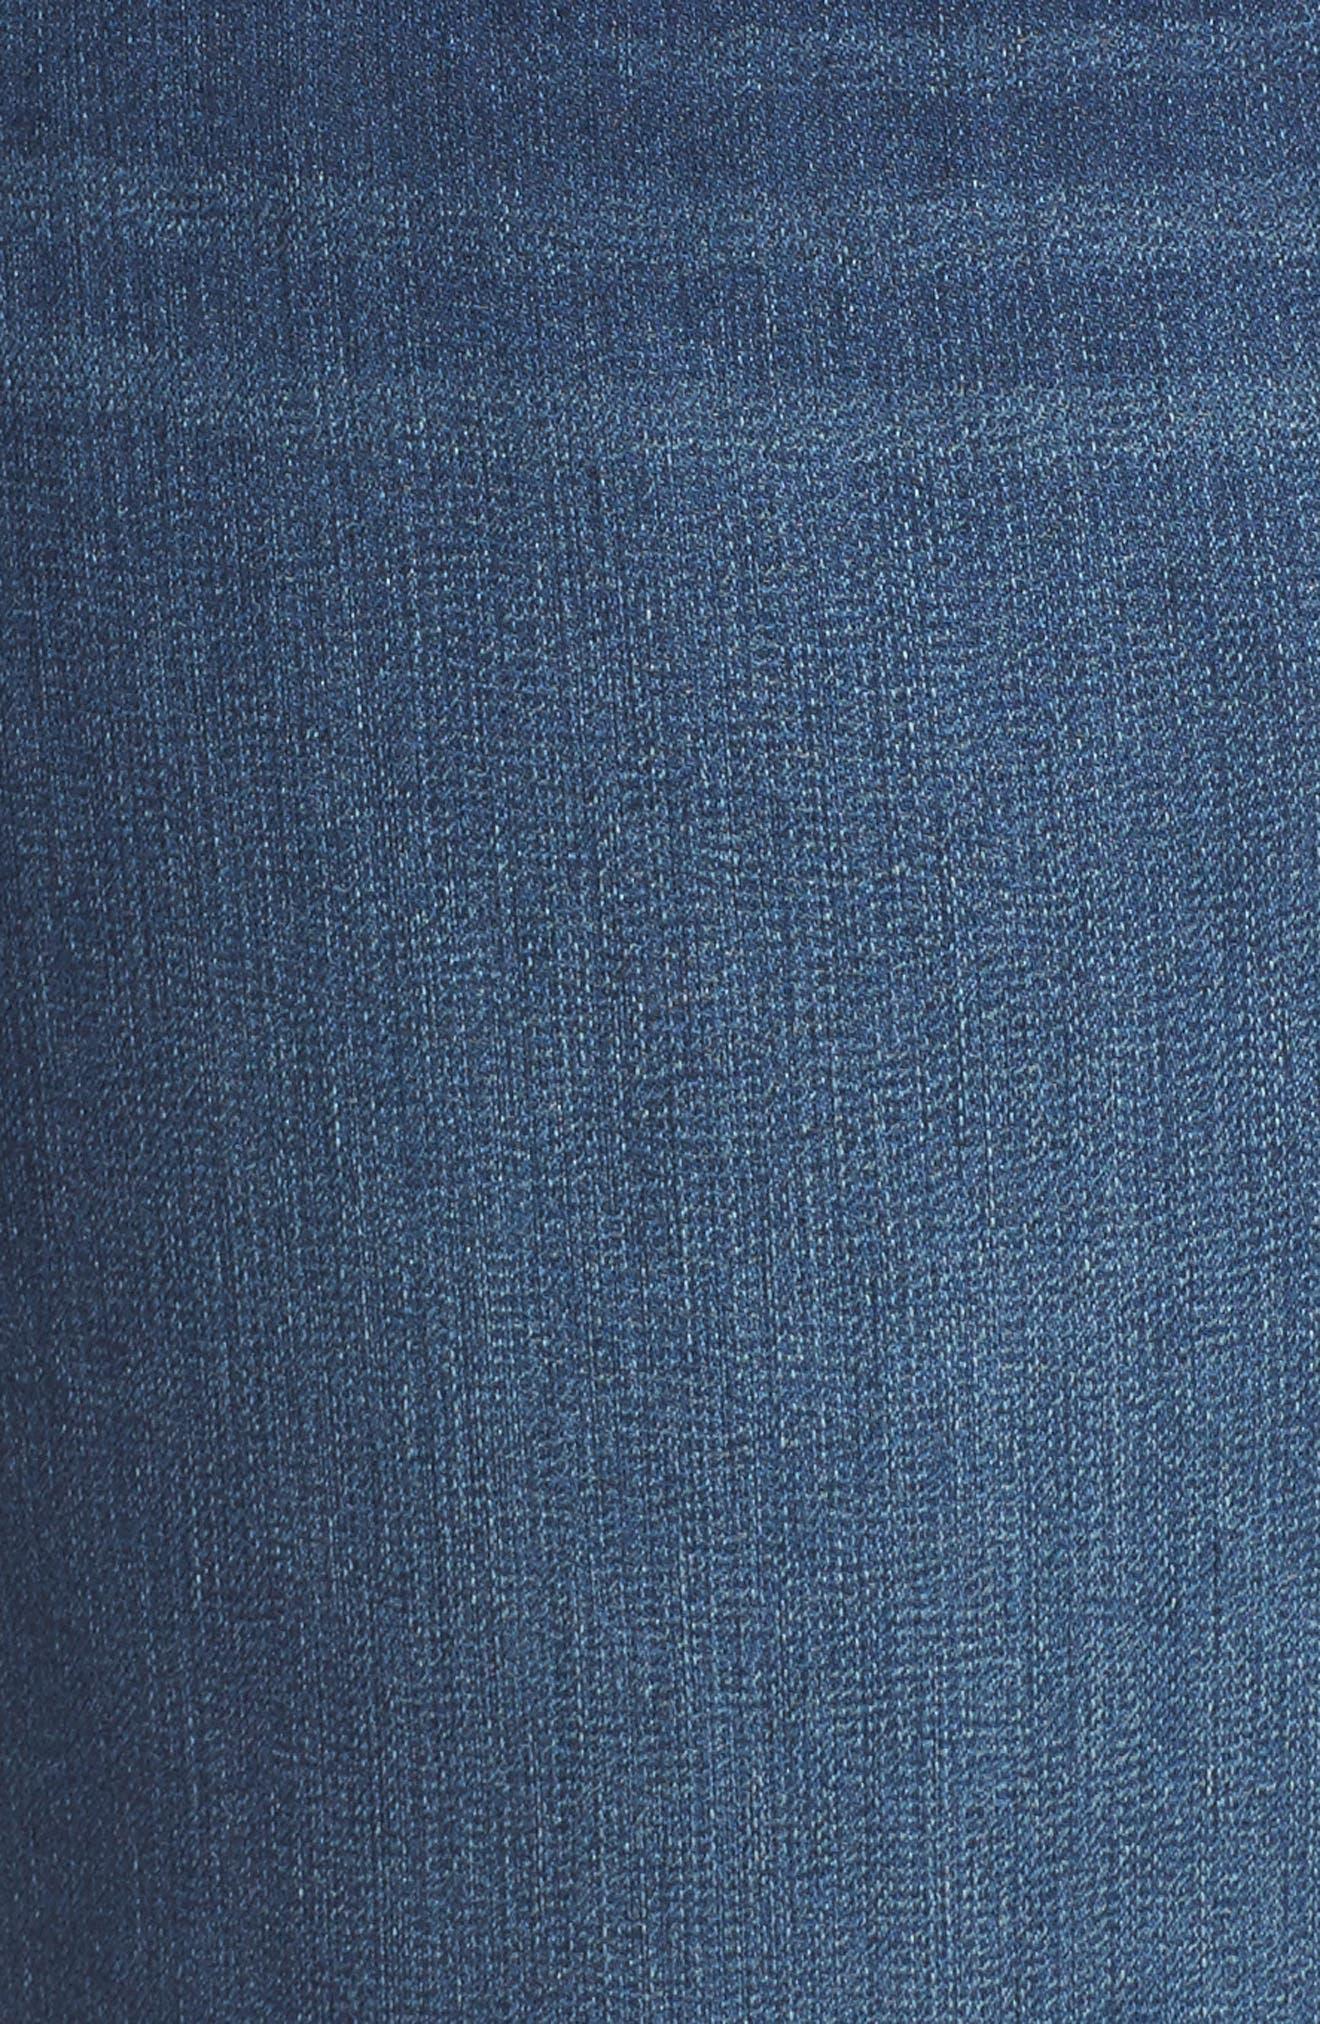 Ab-solution Denim Bermuda Shorts,                             Alternate thumbnail 6, color,                             Blue